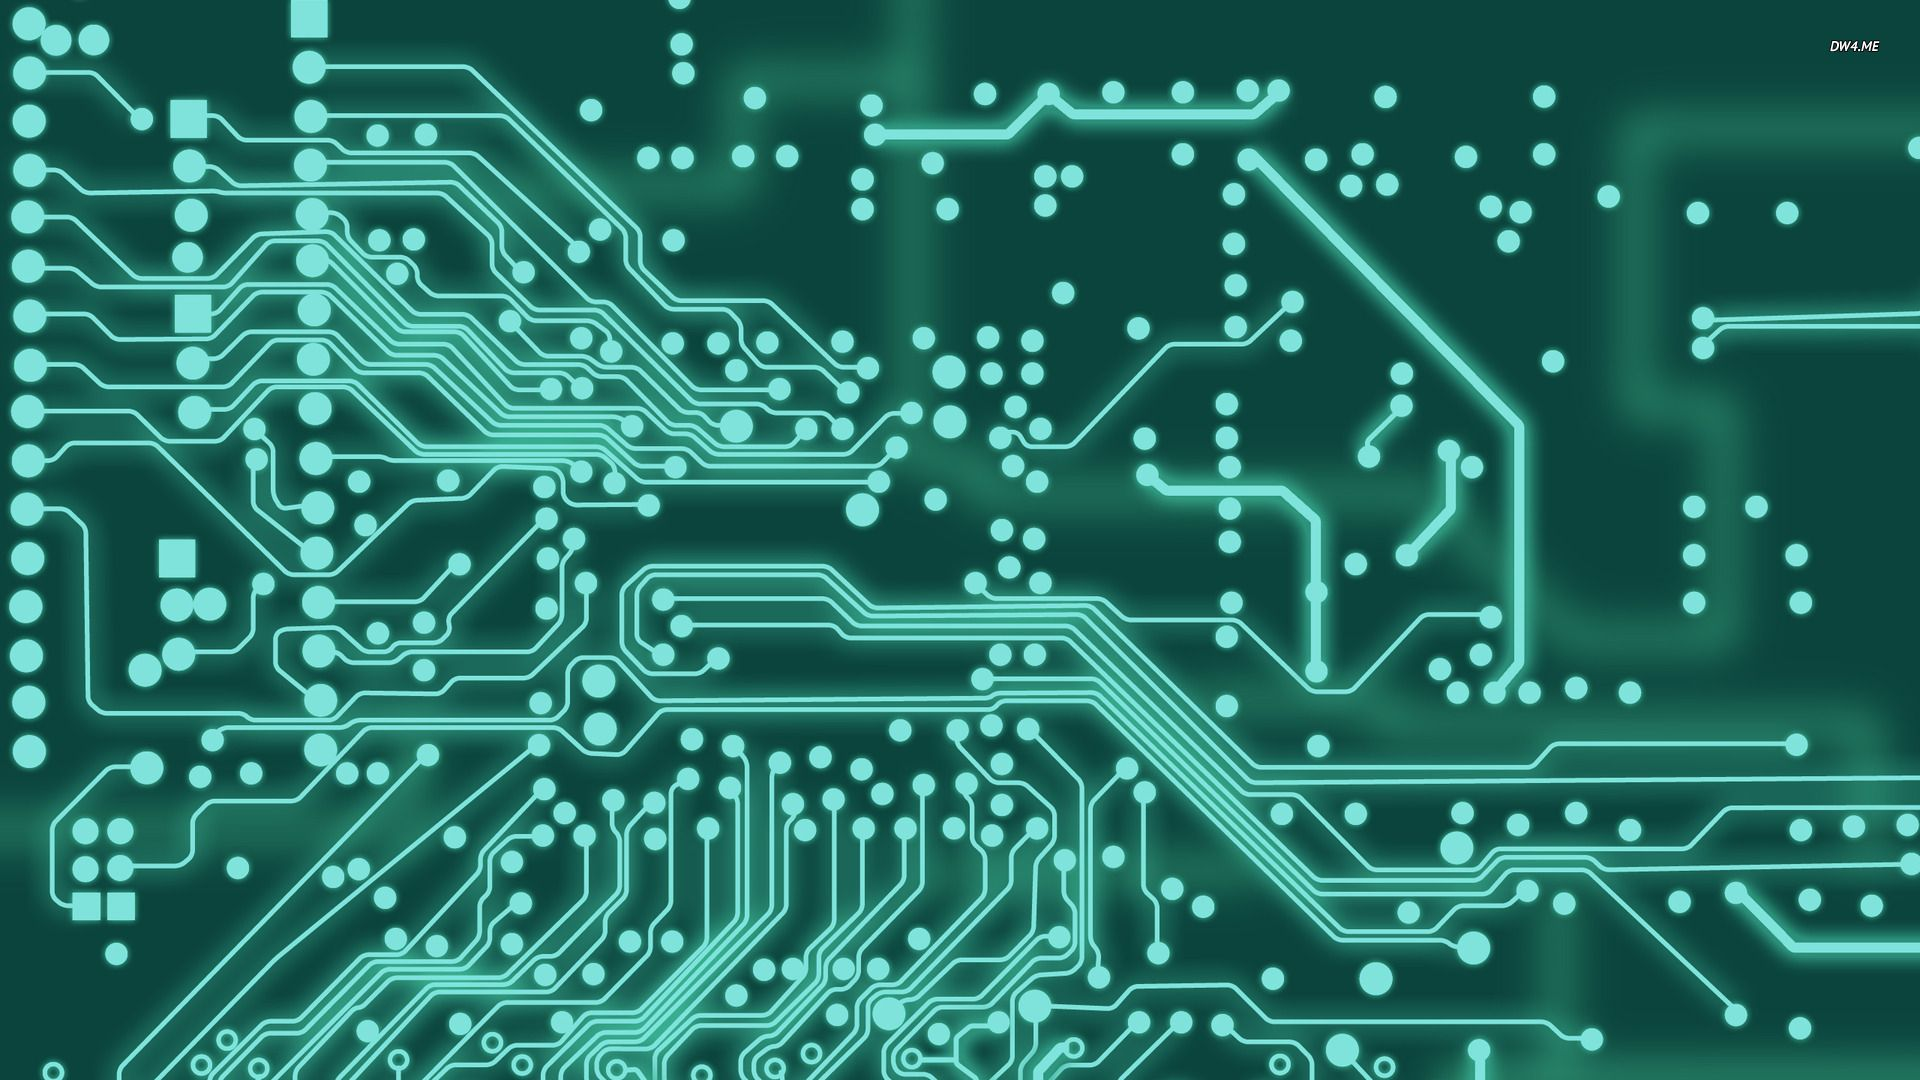 circuit board circuit board wallpaper 2560x1600 more [ 1920 x 1080 Pixel ]